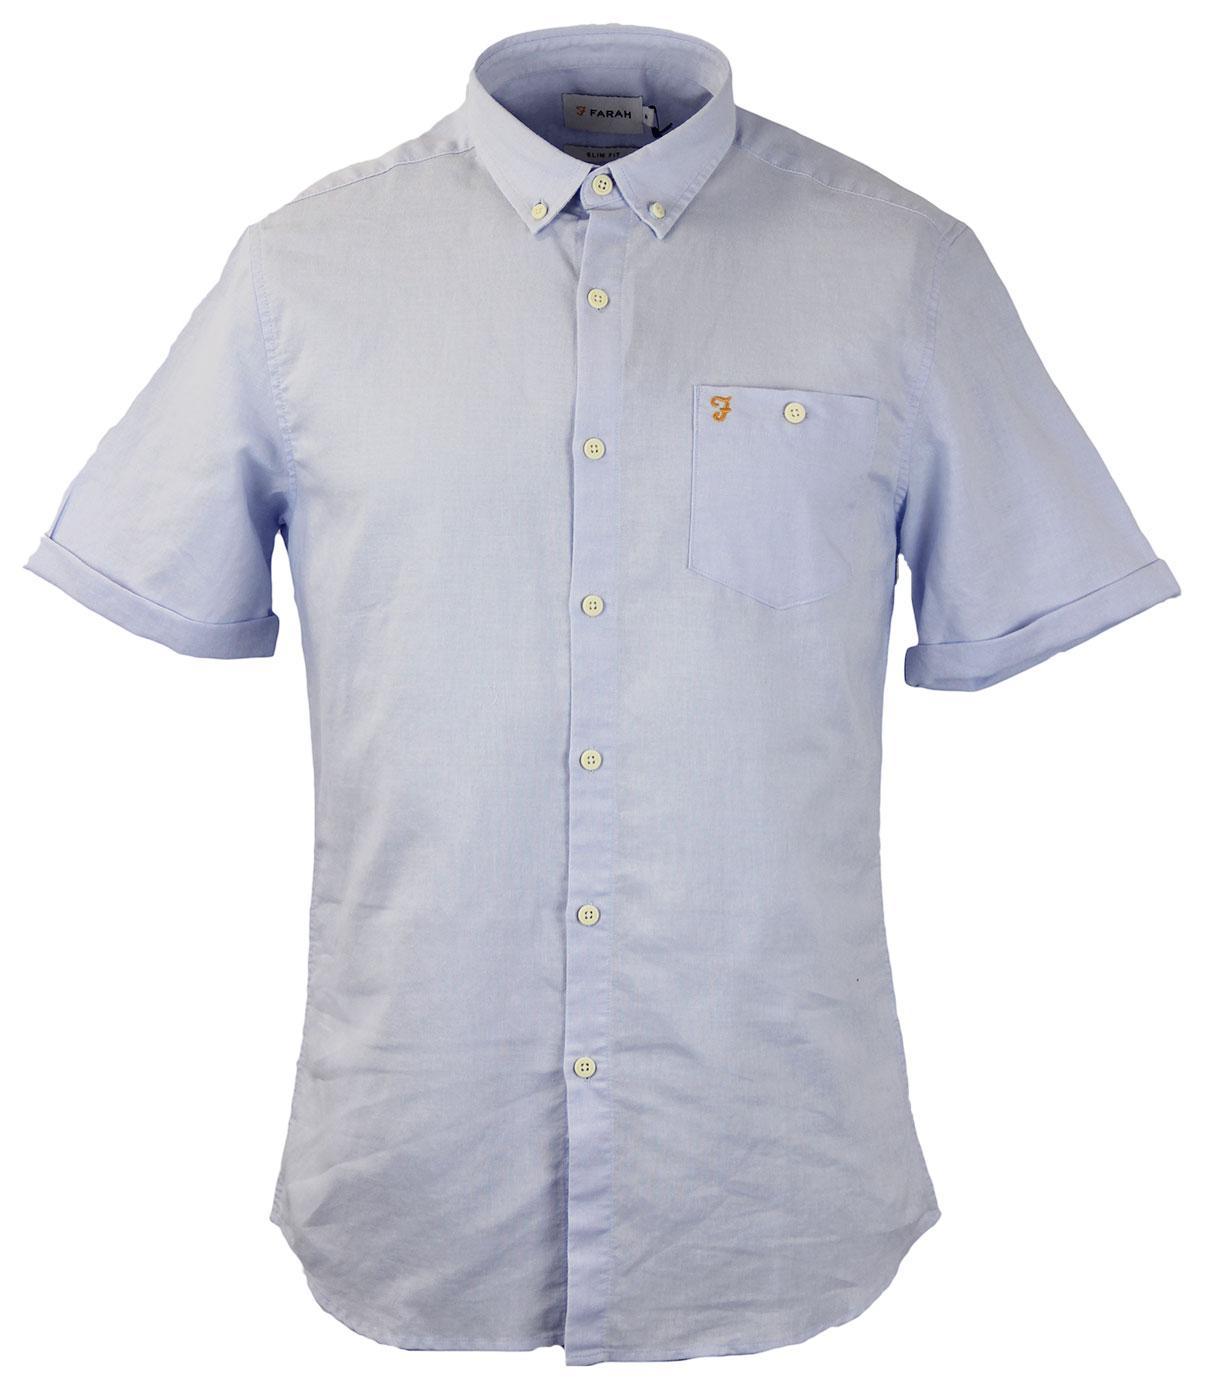 Trent FARAH VINTAGE Retro Mod S/S Ramie Shirt (IB)